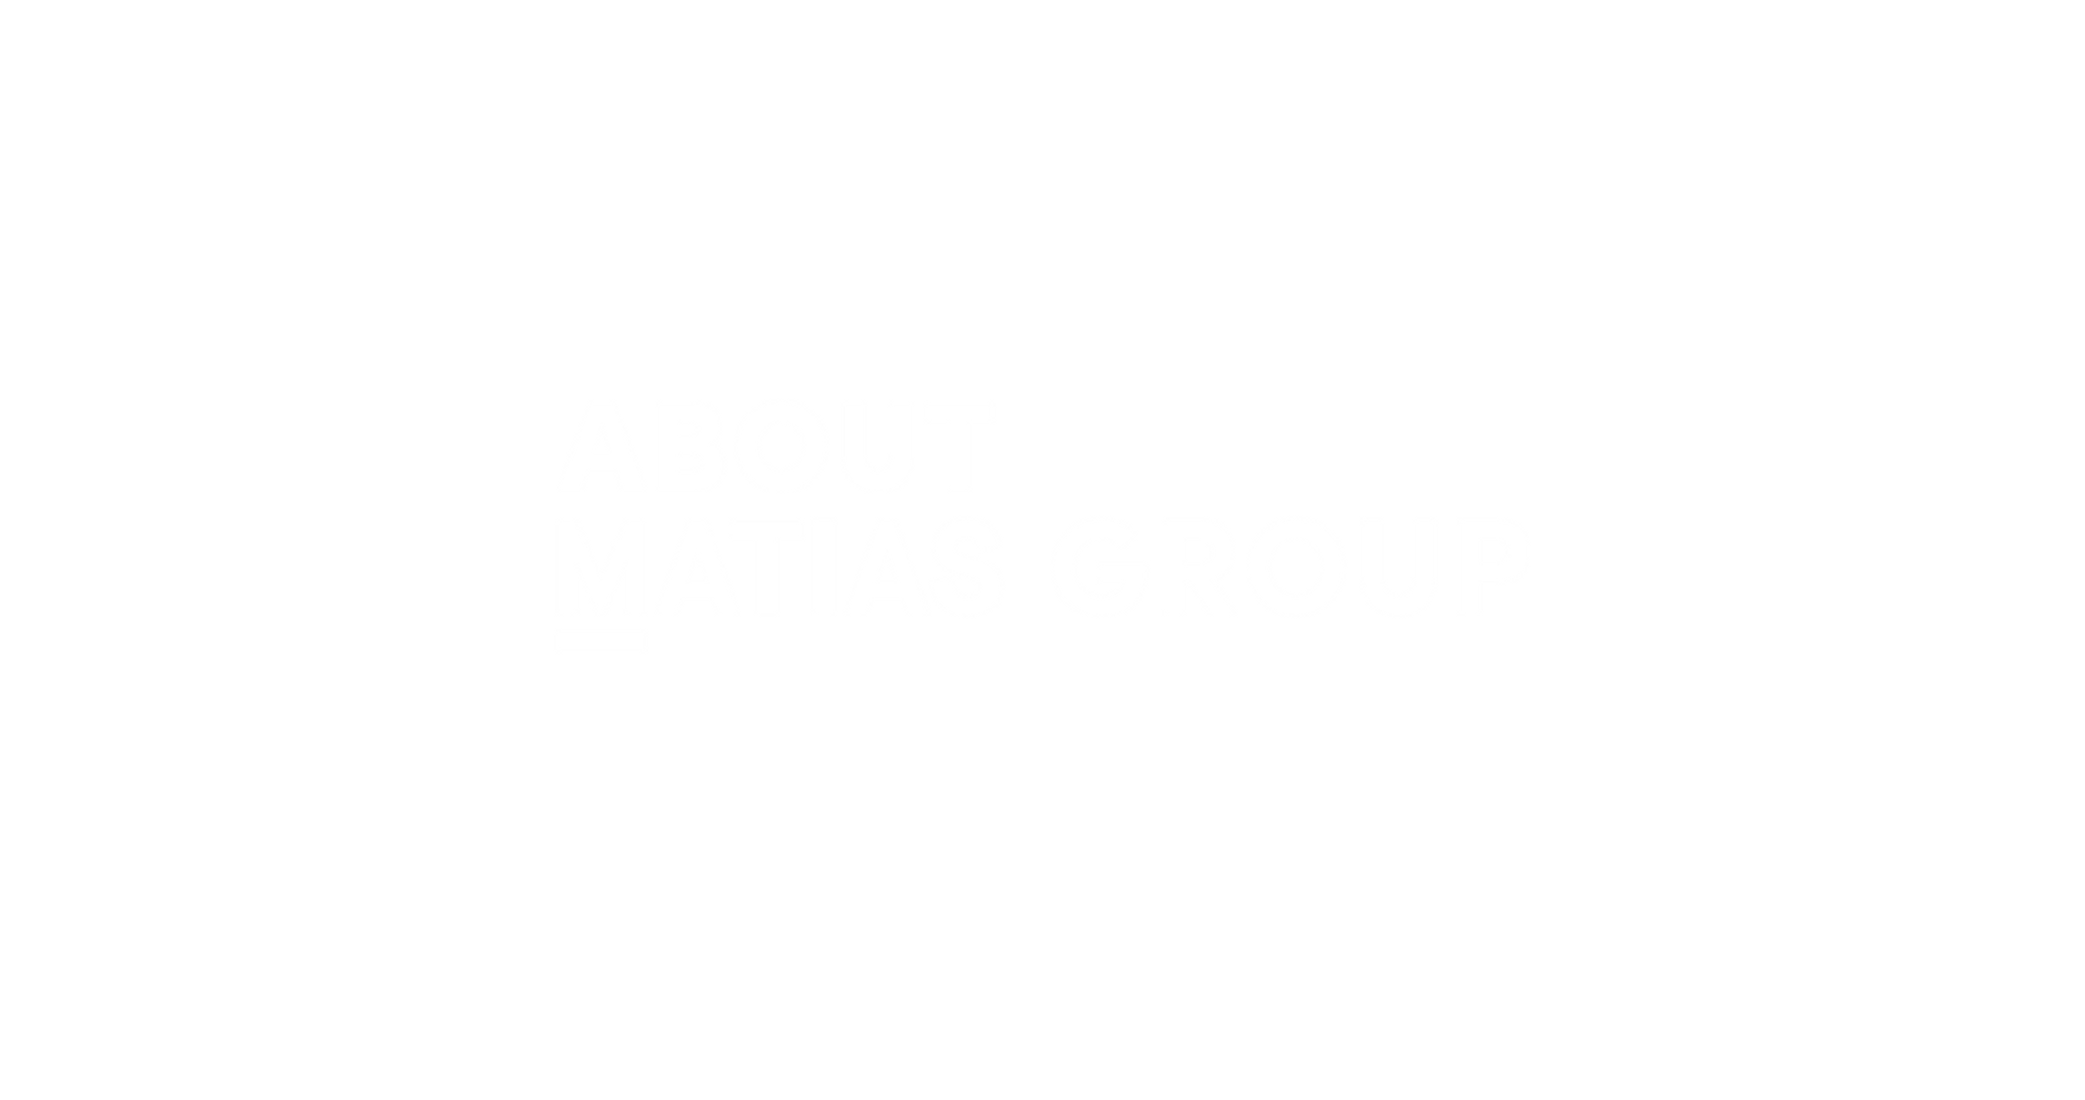 ABOUT MATIAS.png